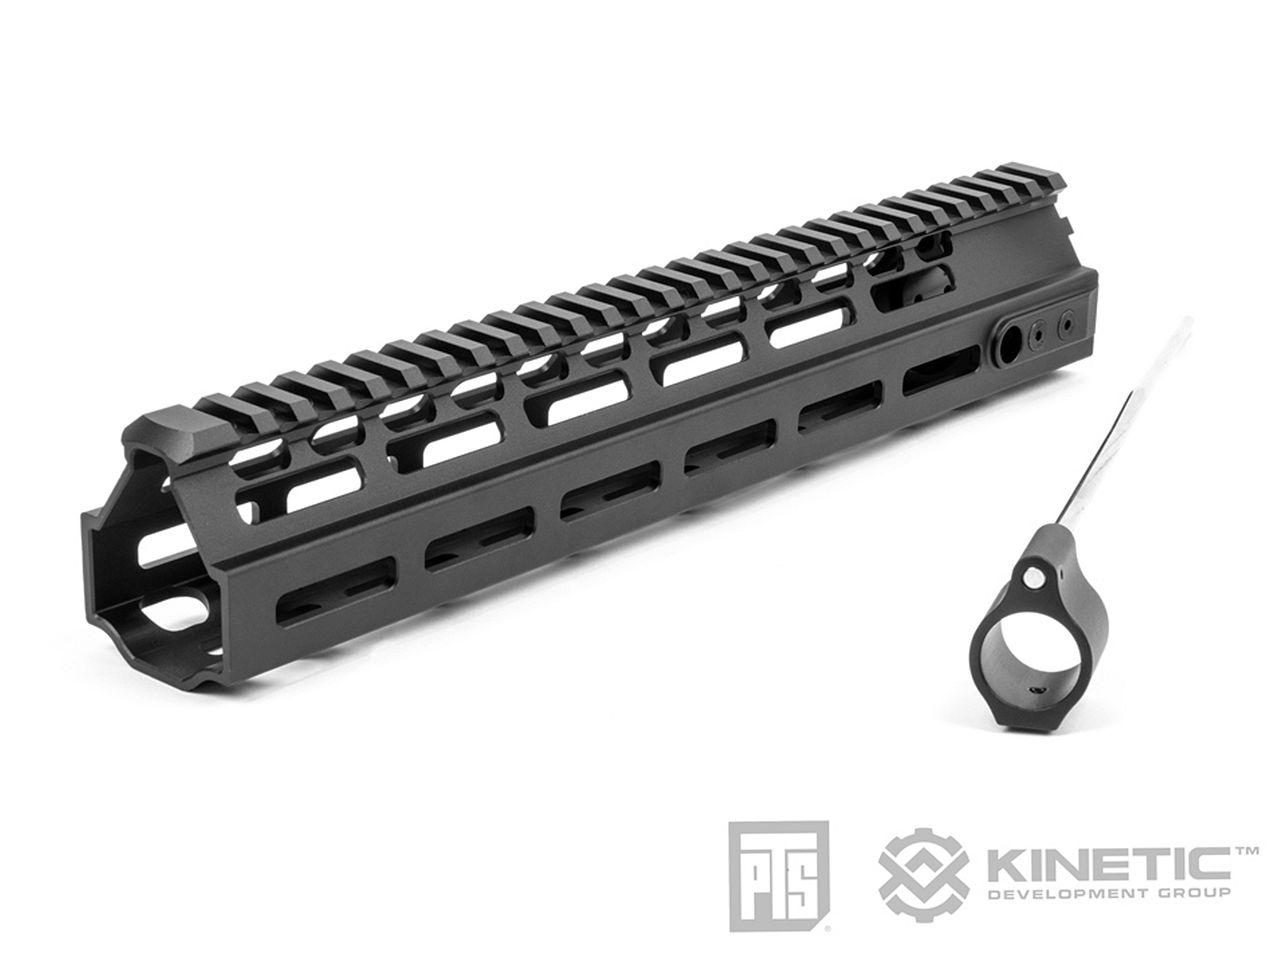 PTS Kinetic MREX-AR M-Lok モジュラーレイルハンドガード 11in (Black)